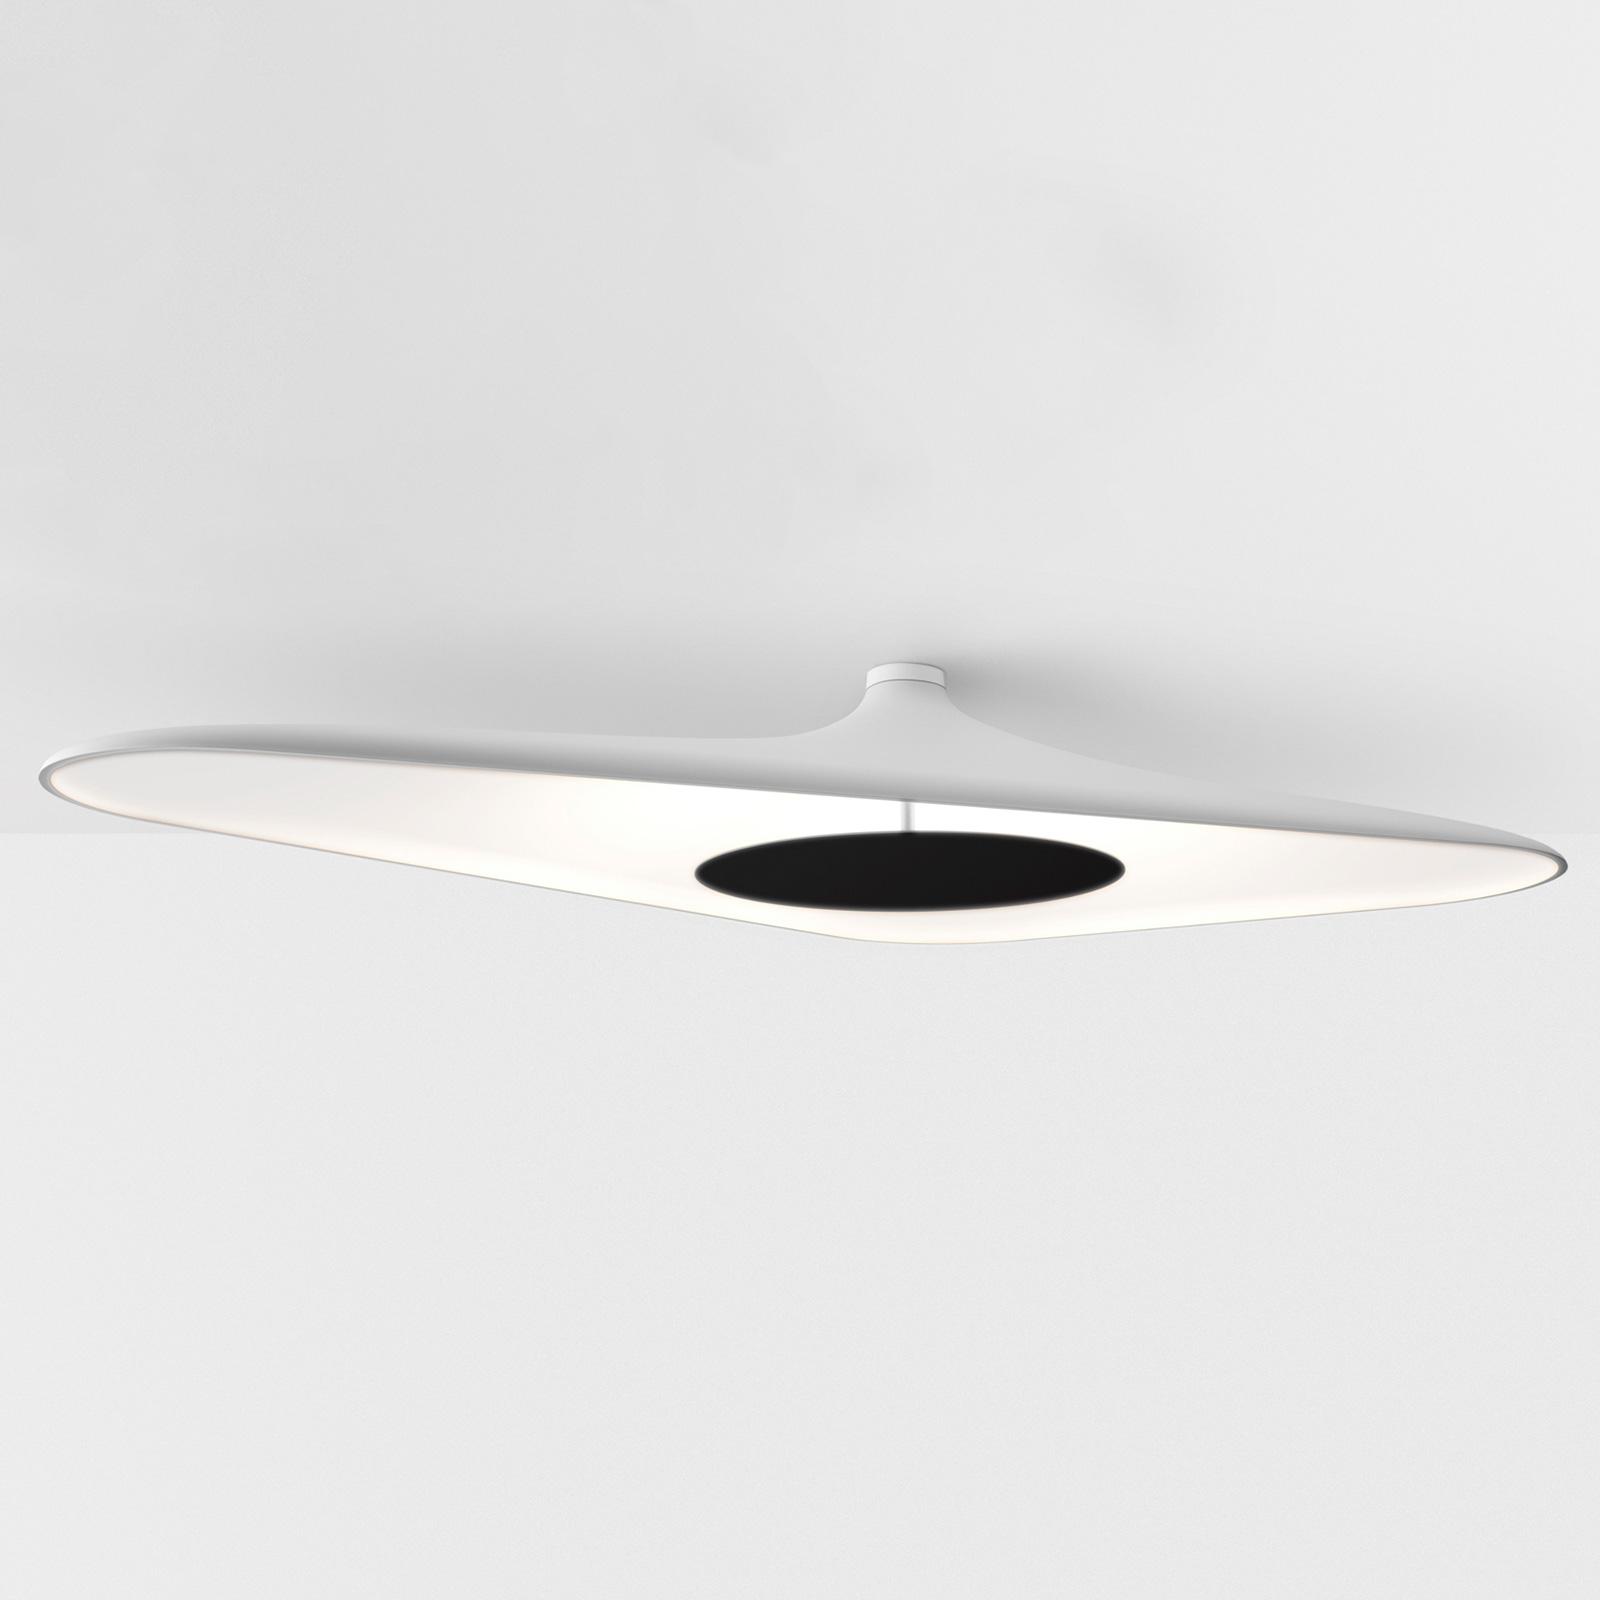 Luceplan Soleil Noir lampa sufitowa LED, biała